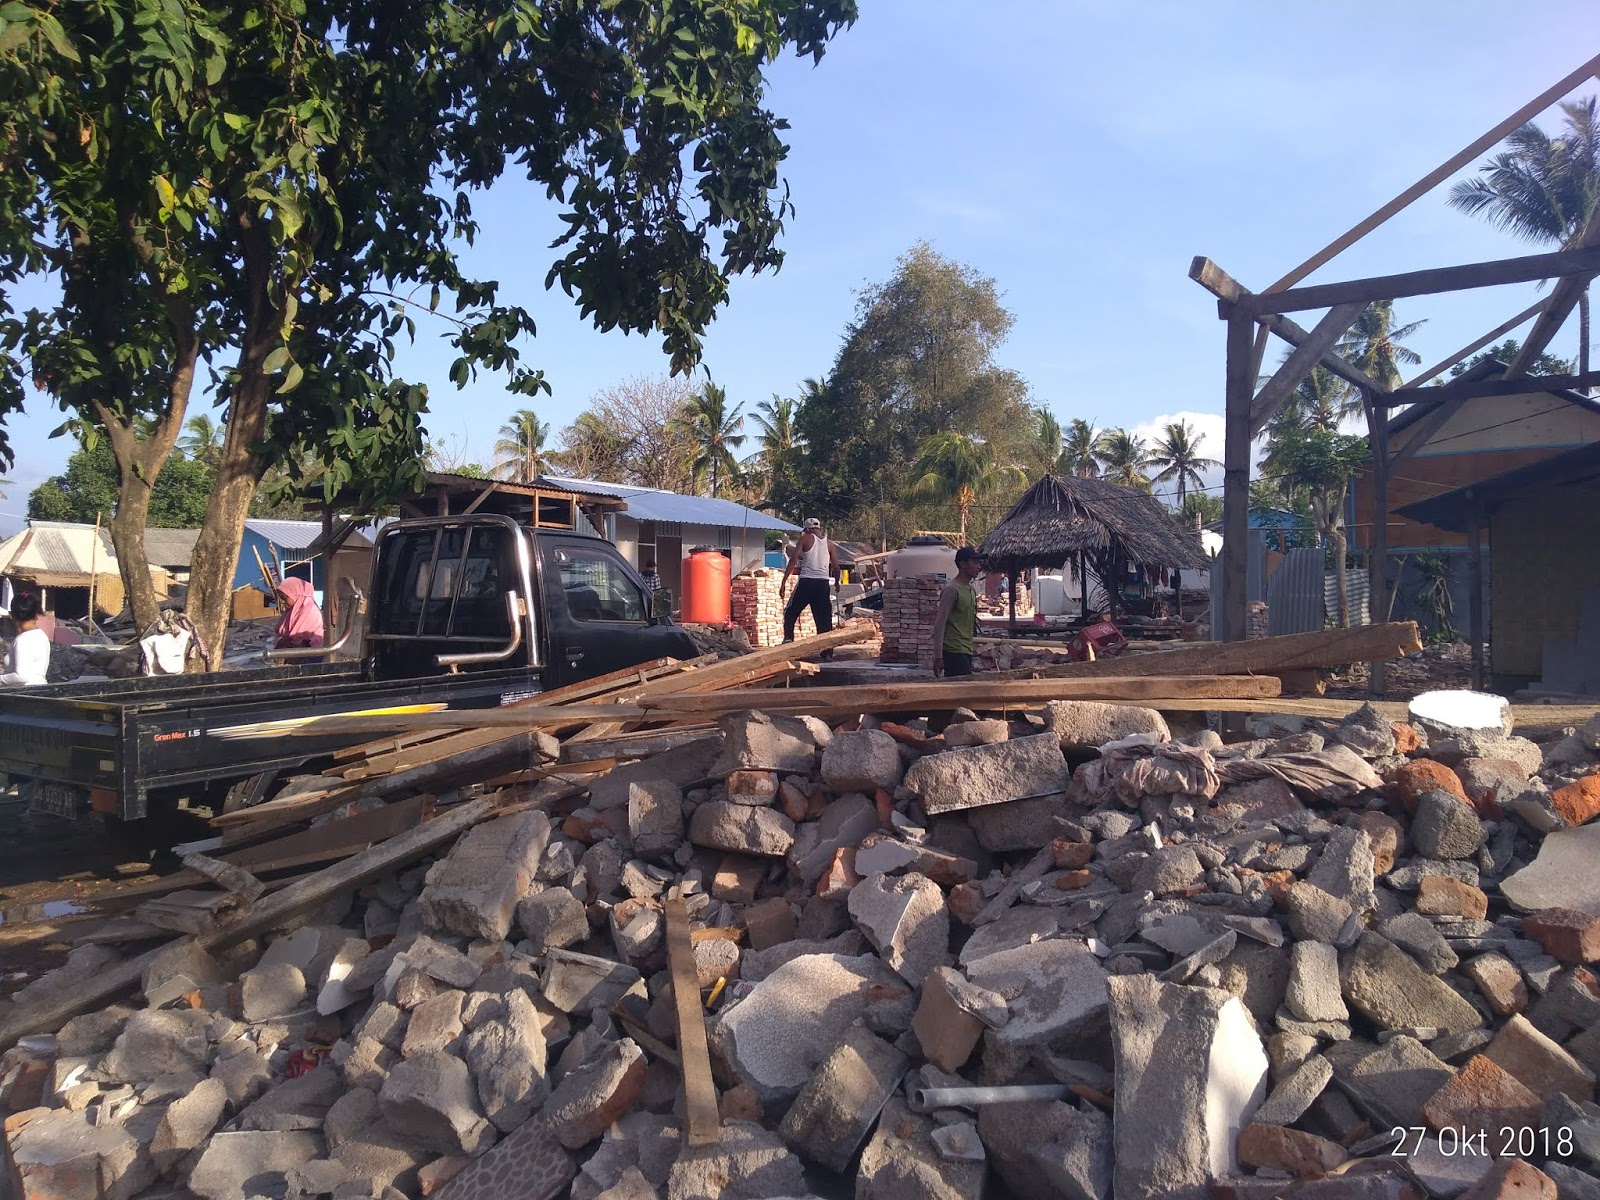 Minim Pemberitaan, Kondisi Korban Gempa Lombok Miris dan Memprihatinkan